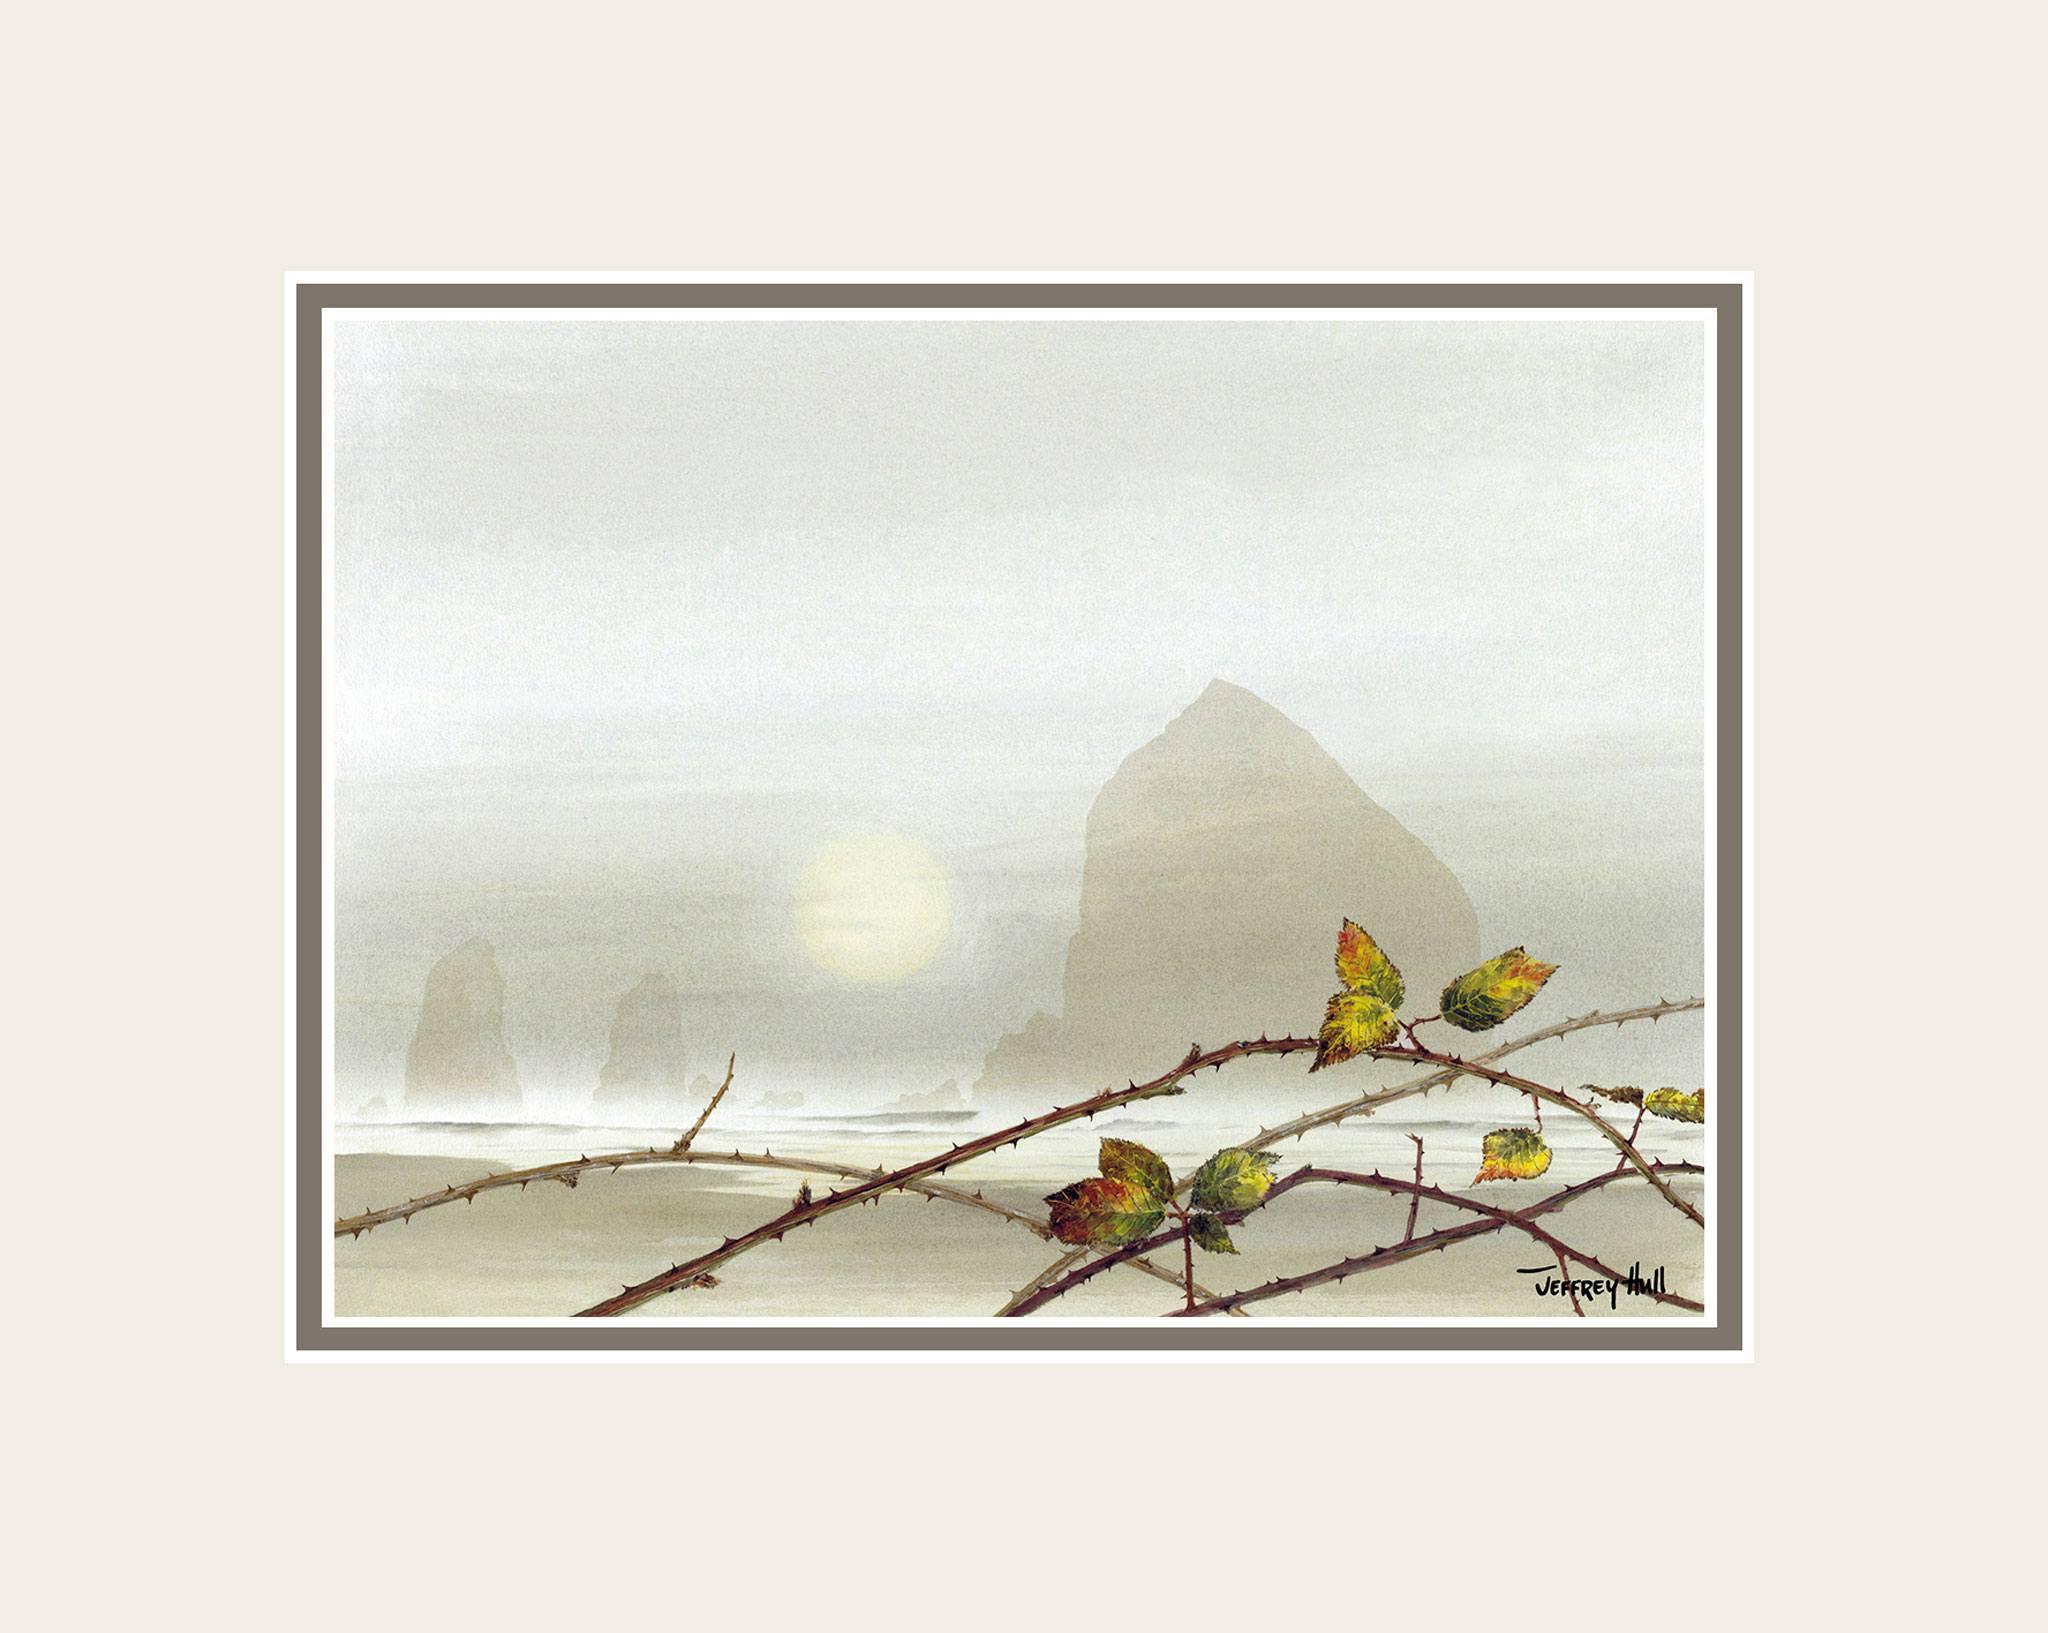 Bound-For-Winter-Mini-Unframed-Talc-Balmoral-4-Website-2021